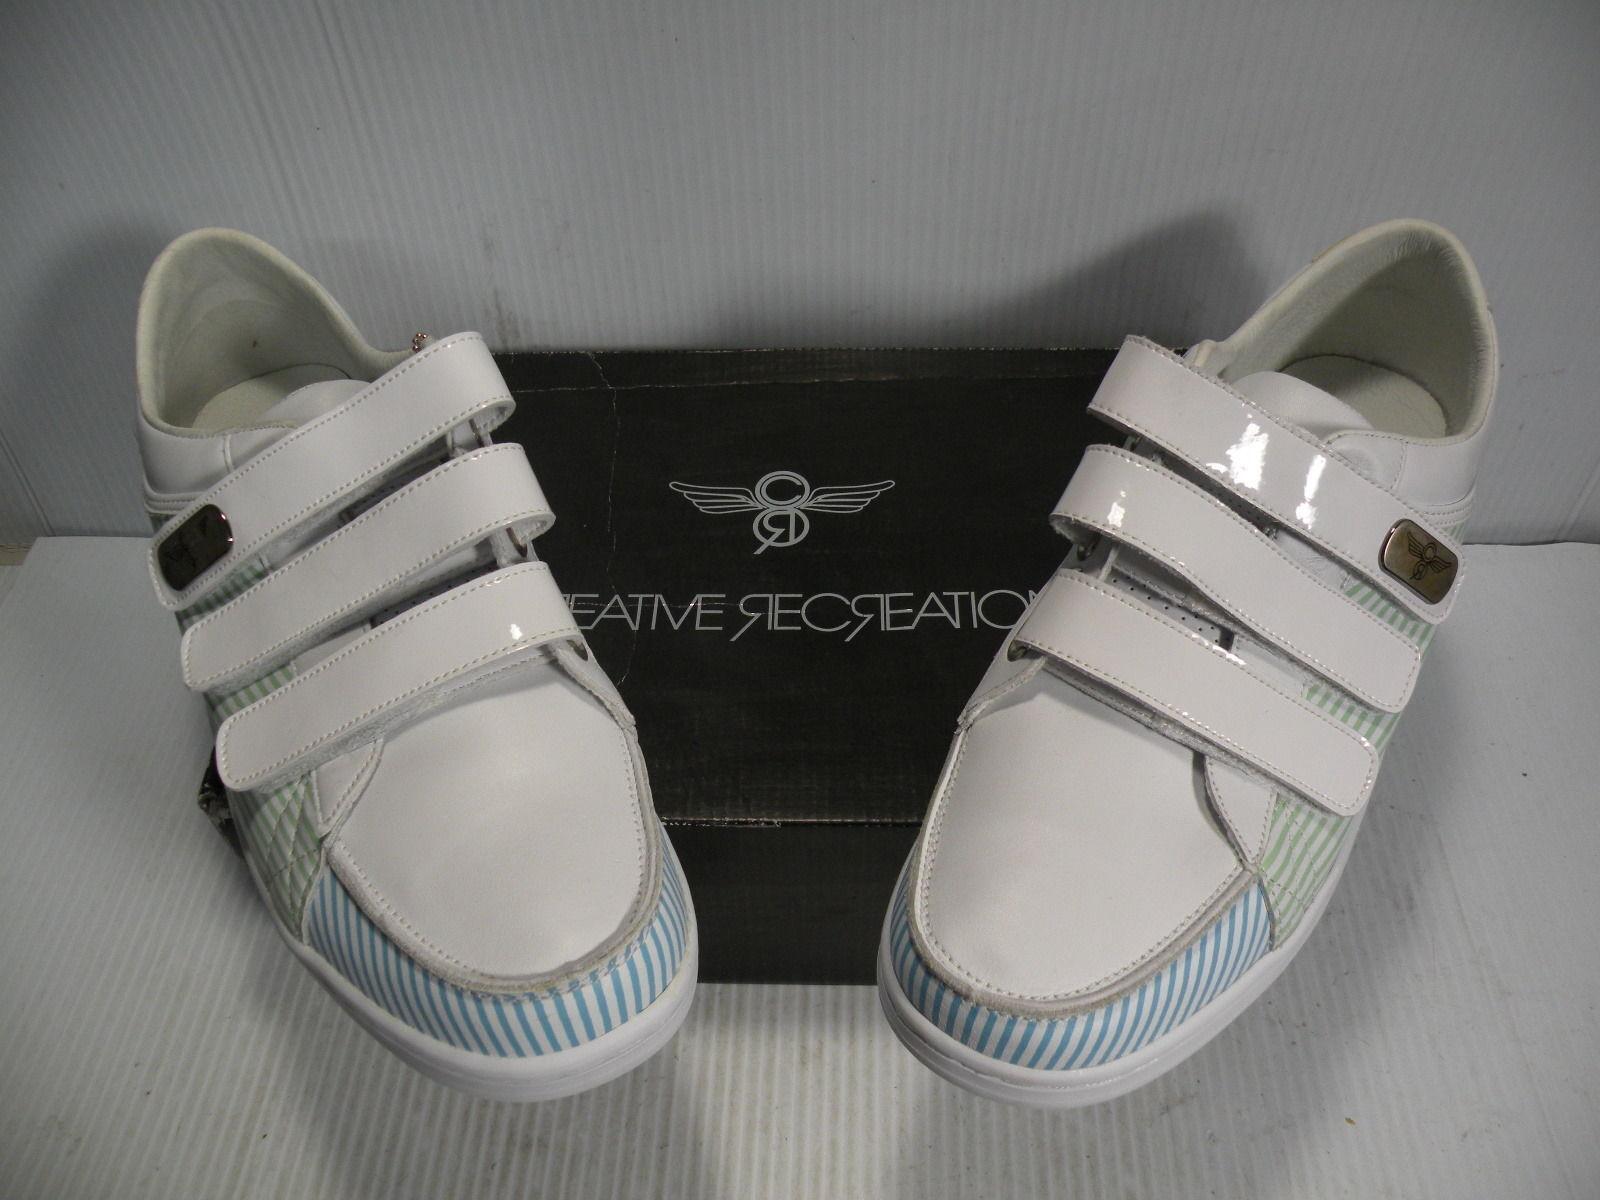 Creative Recreation torrio torrio torrio low shoes Mens WHITE SEERSUCKER CR5728 size 11.5 new d3c123